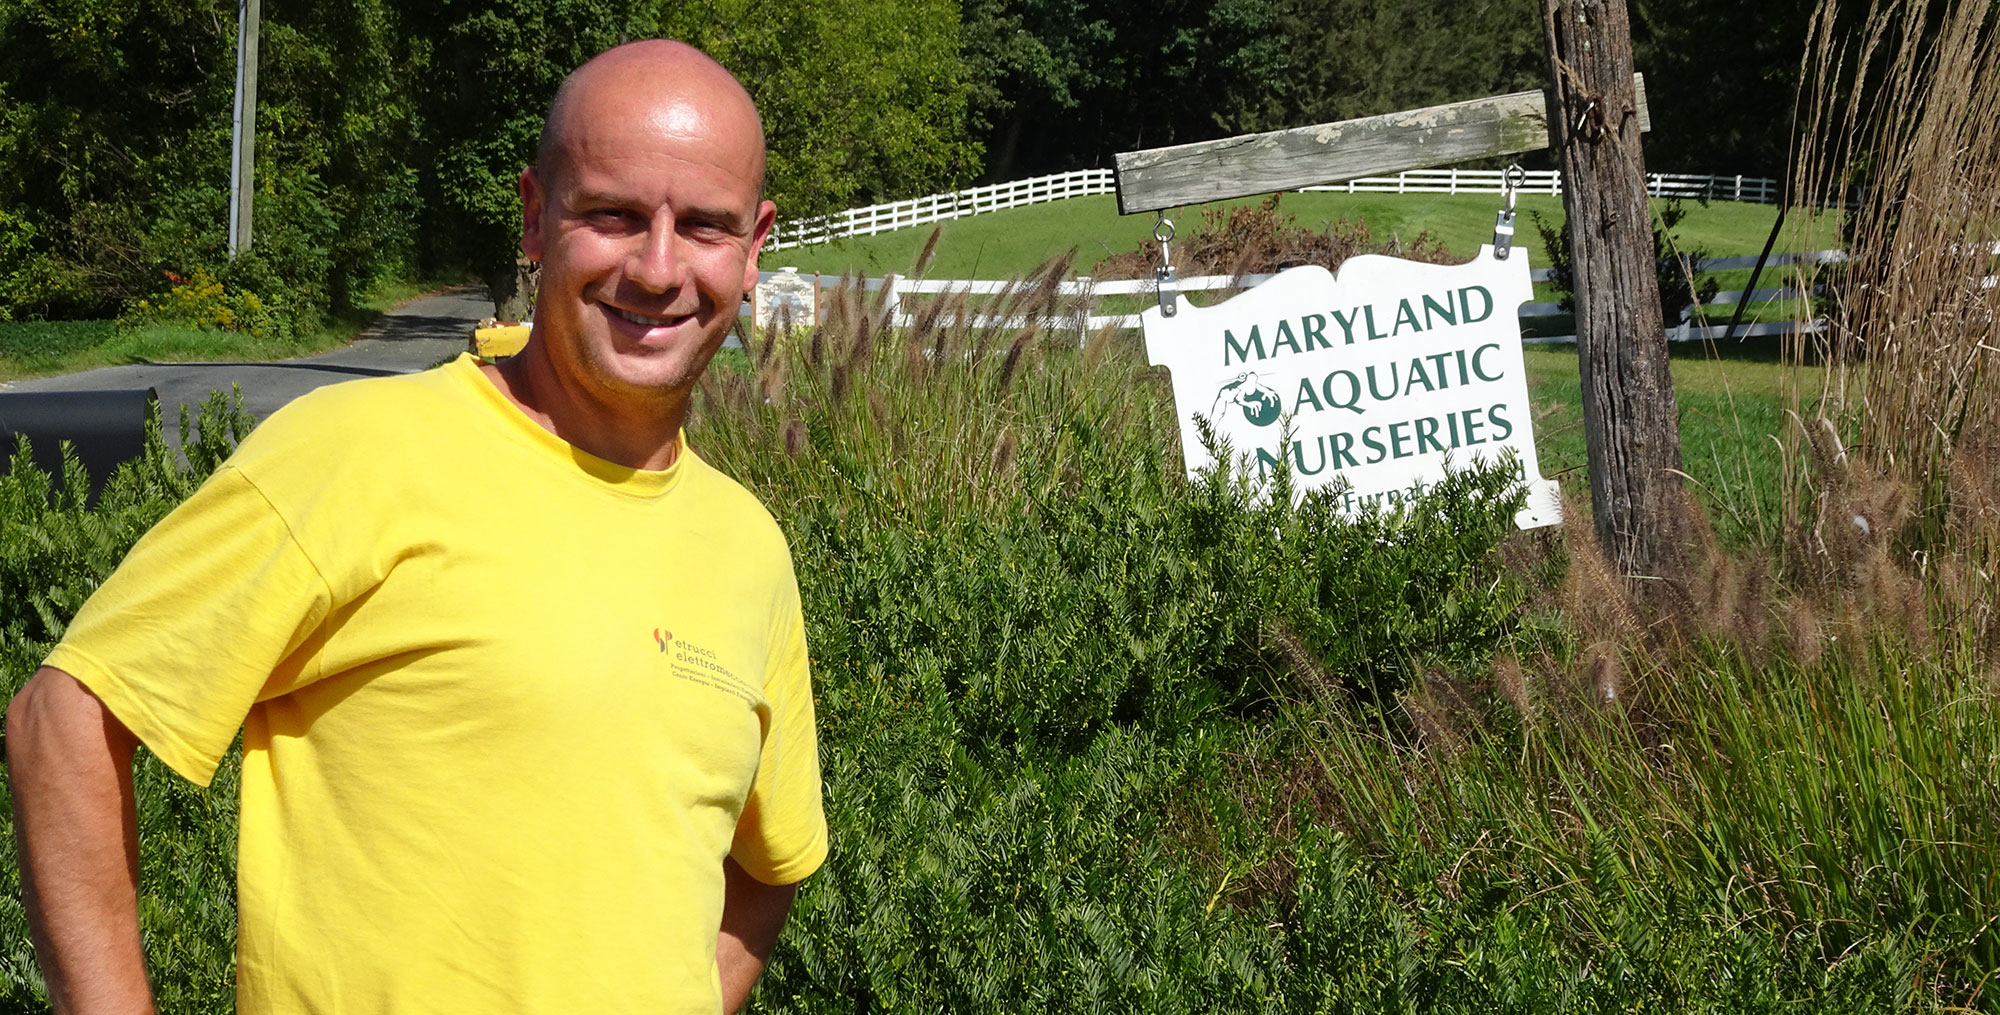 Maryland Aquatic Nursery entrance